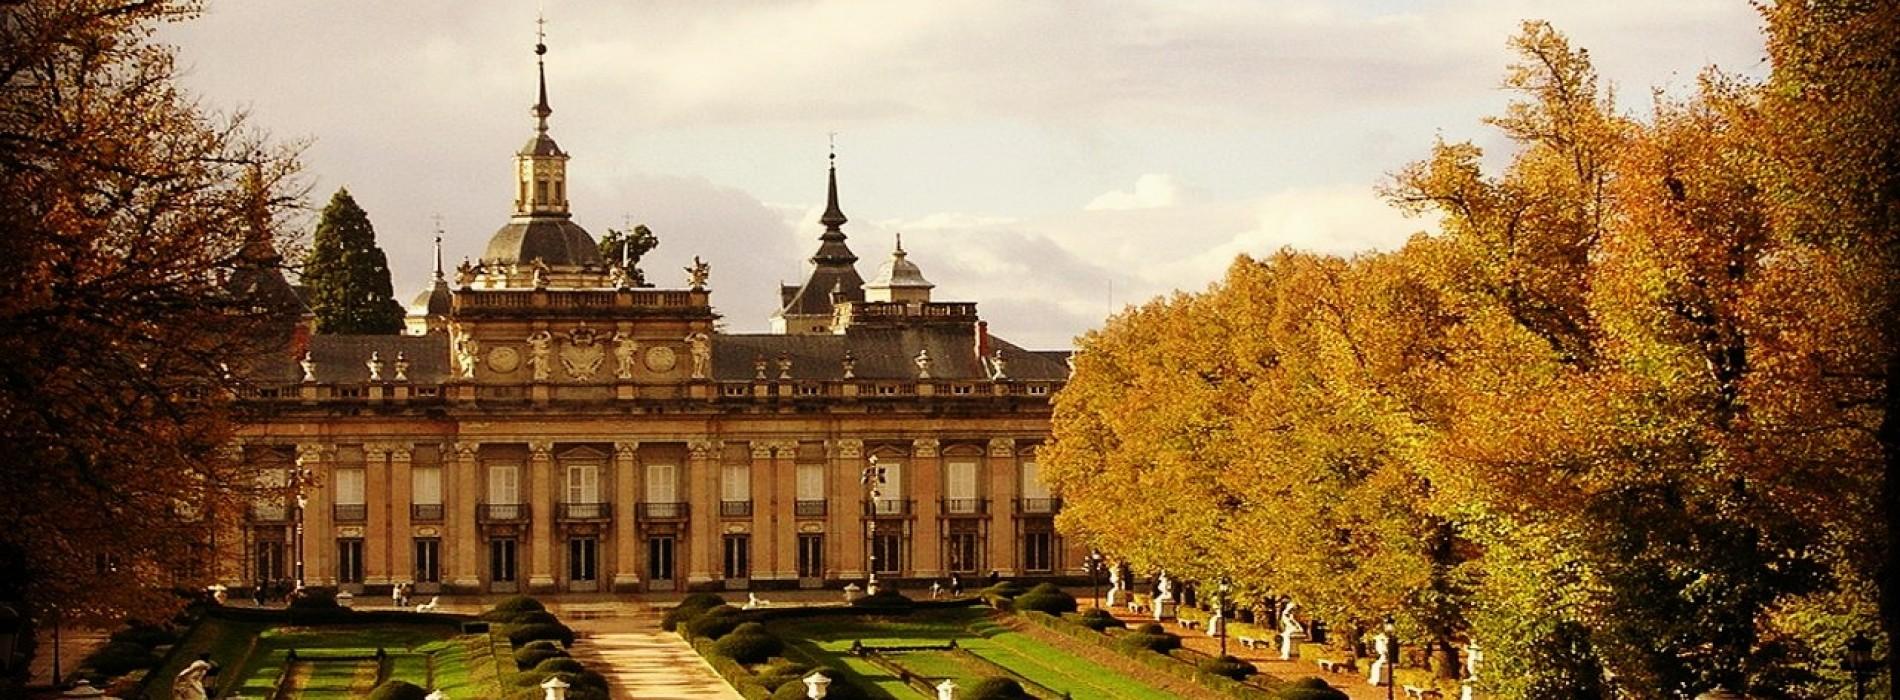 La granja Segovia